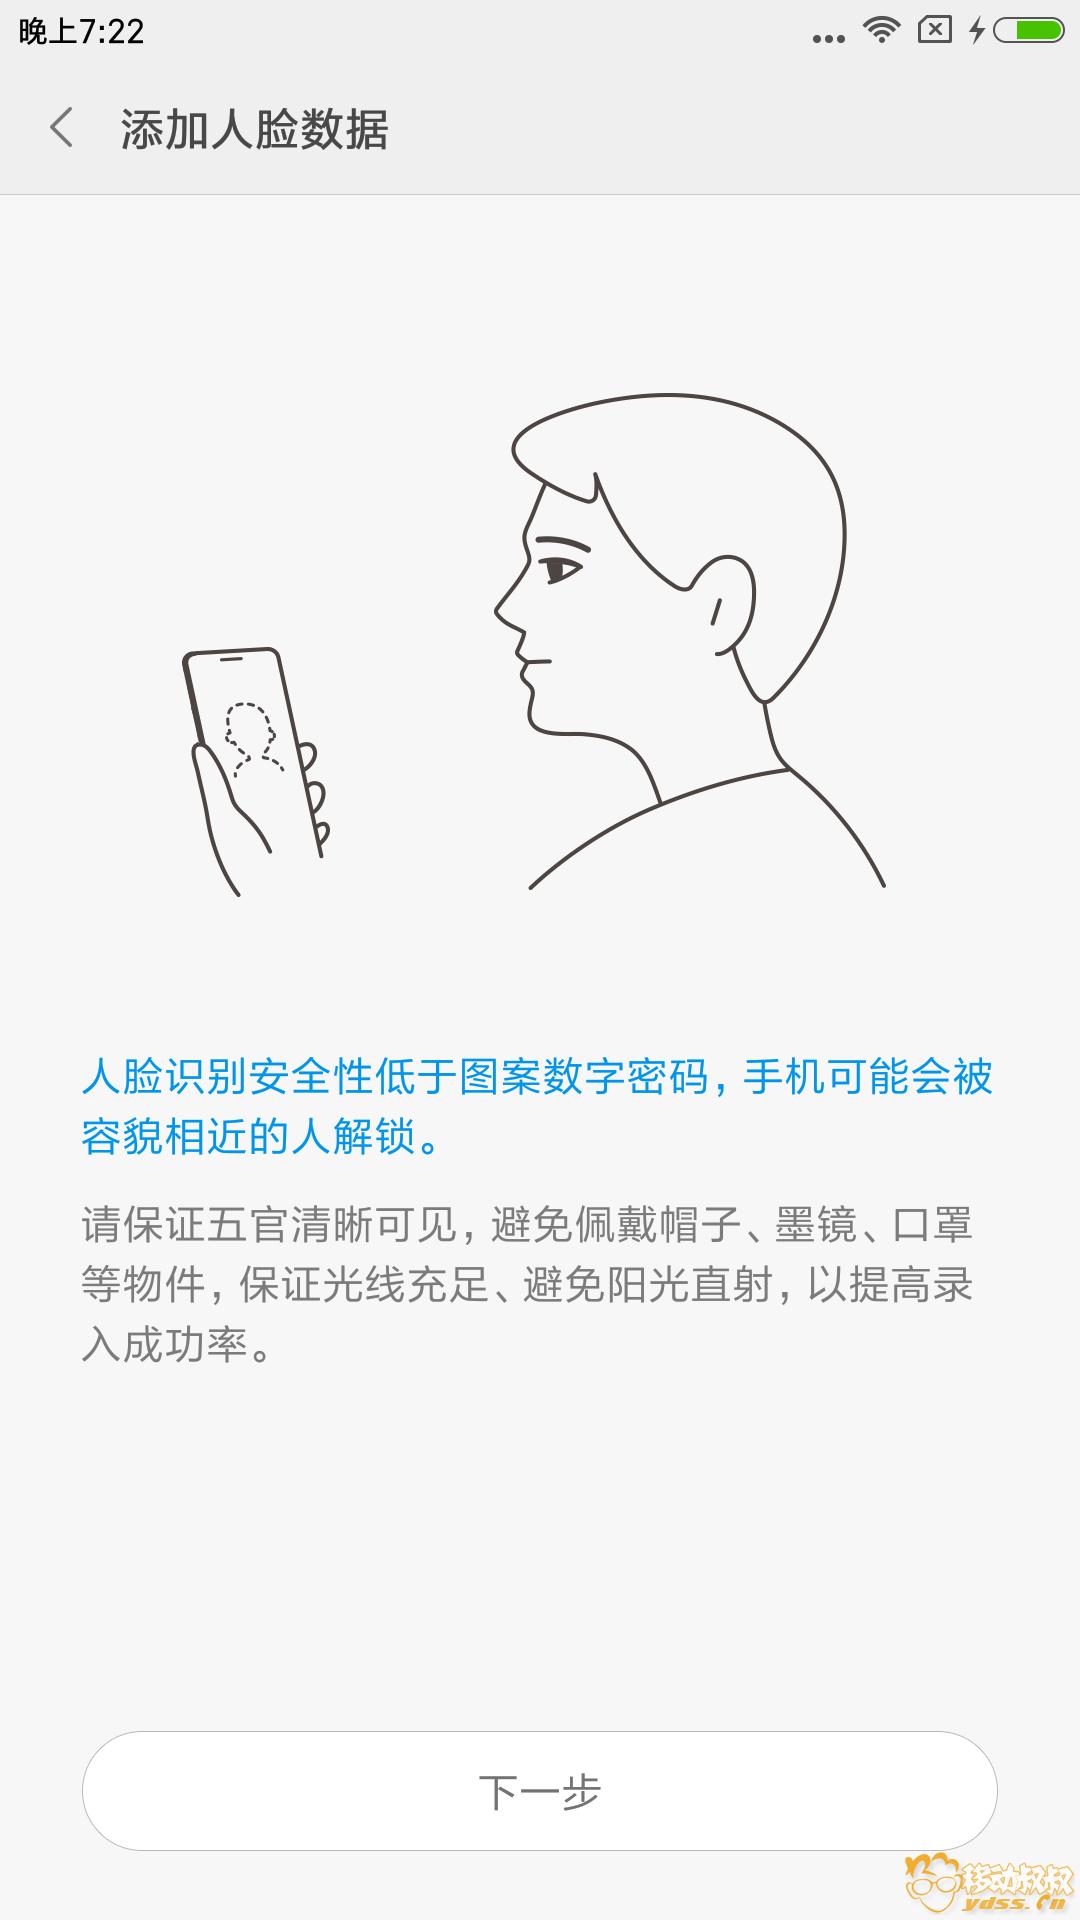 Screenshot_2017-11-25-19-22-53-979_com.android.keyguard.png